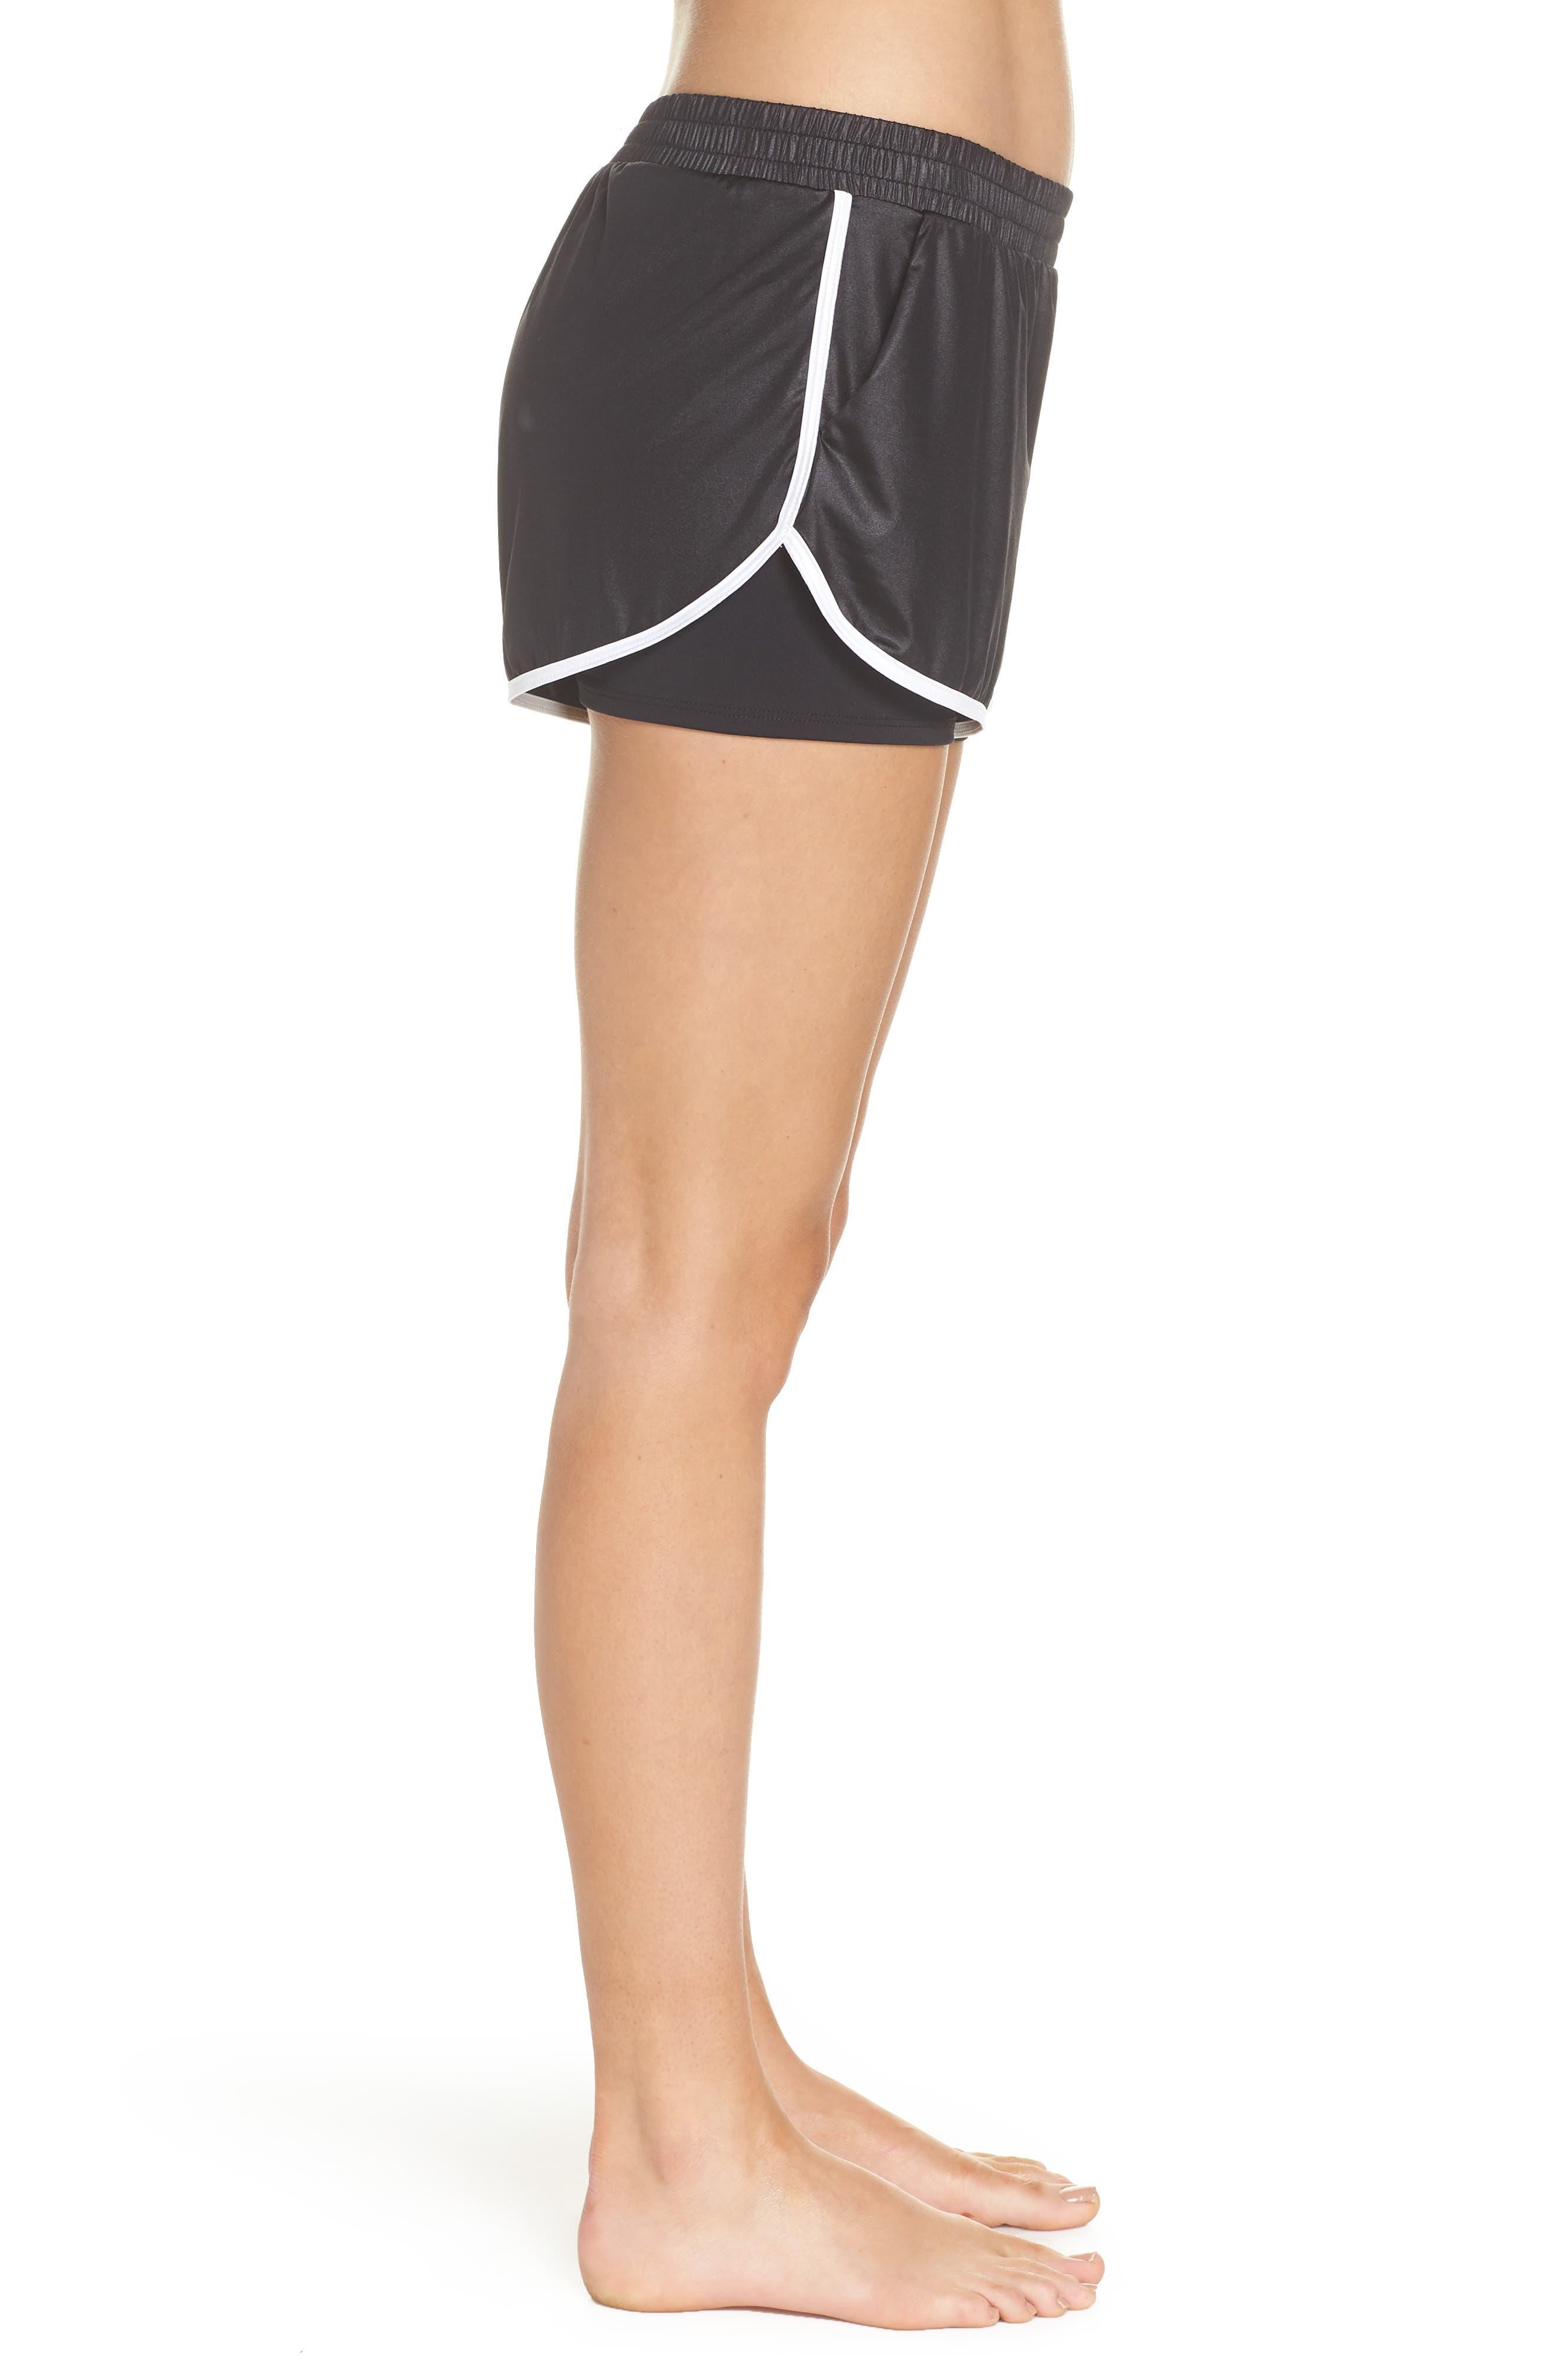 Scout Gym Shorts,                             Alternate thumbnail 3, color,                             BLACK/ WHITE